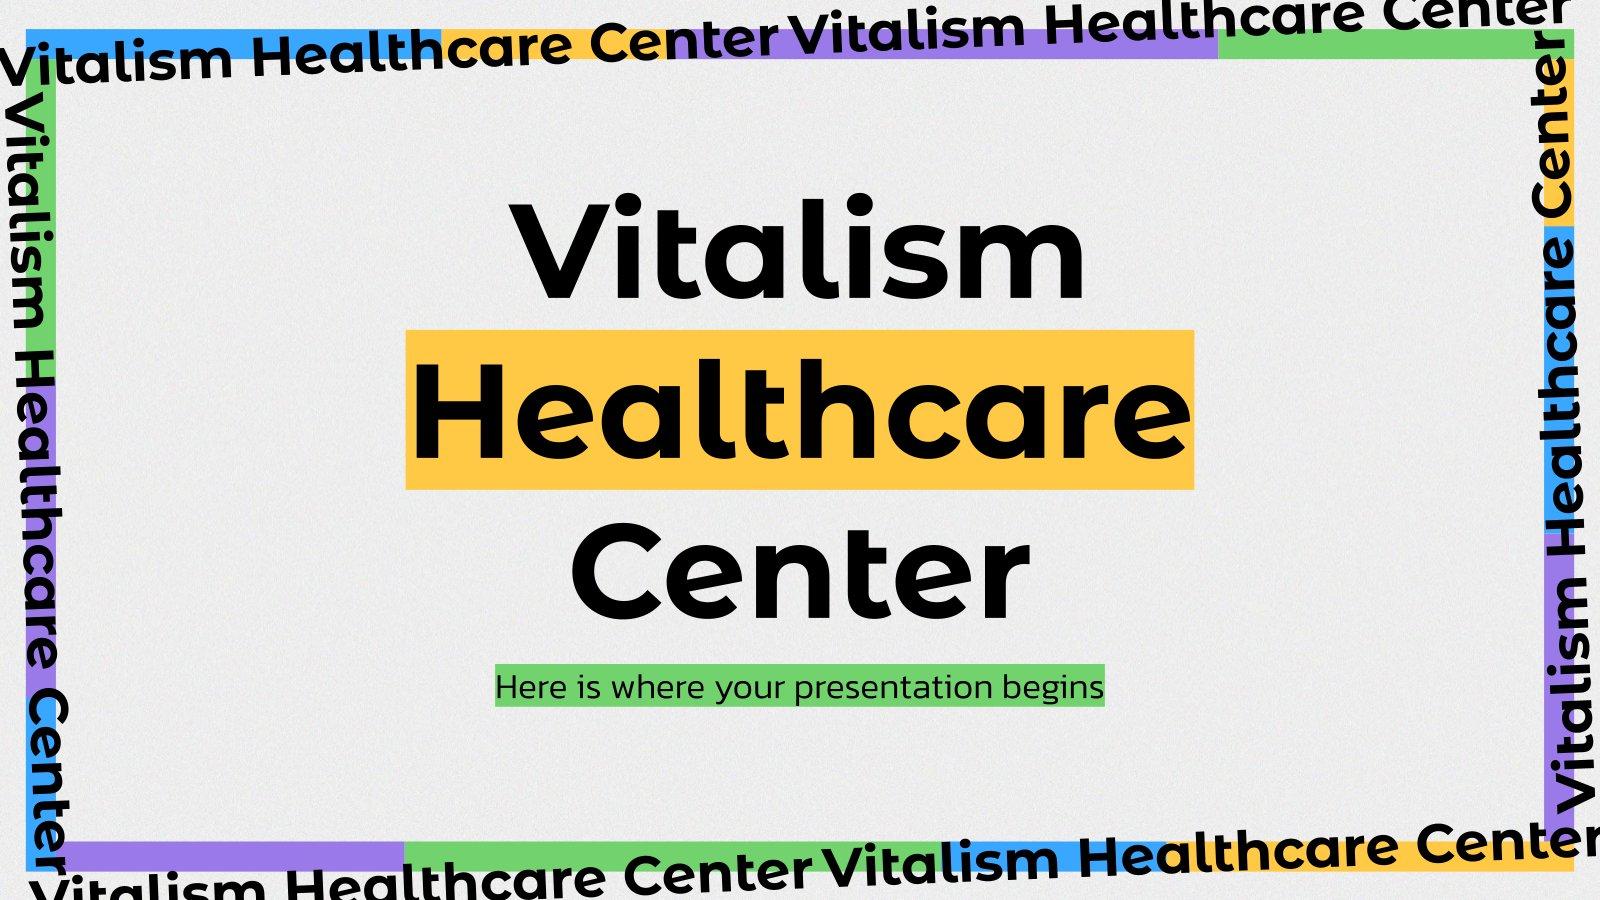 Vitalism Healthcare Center presentation template